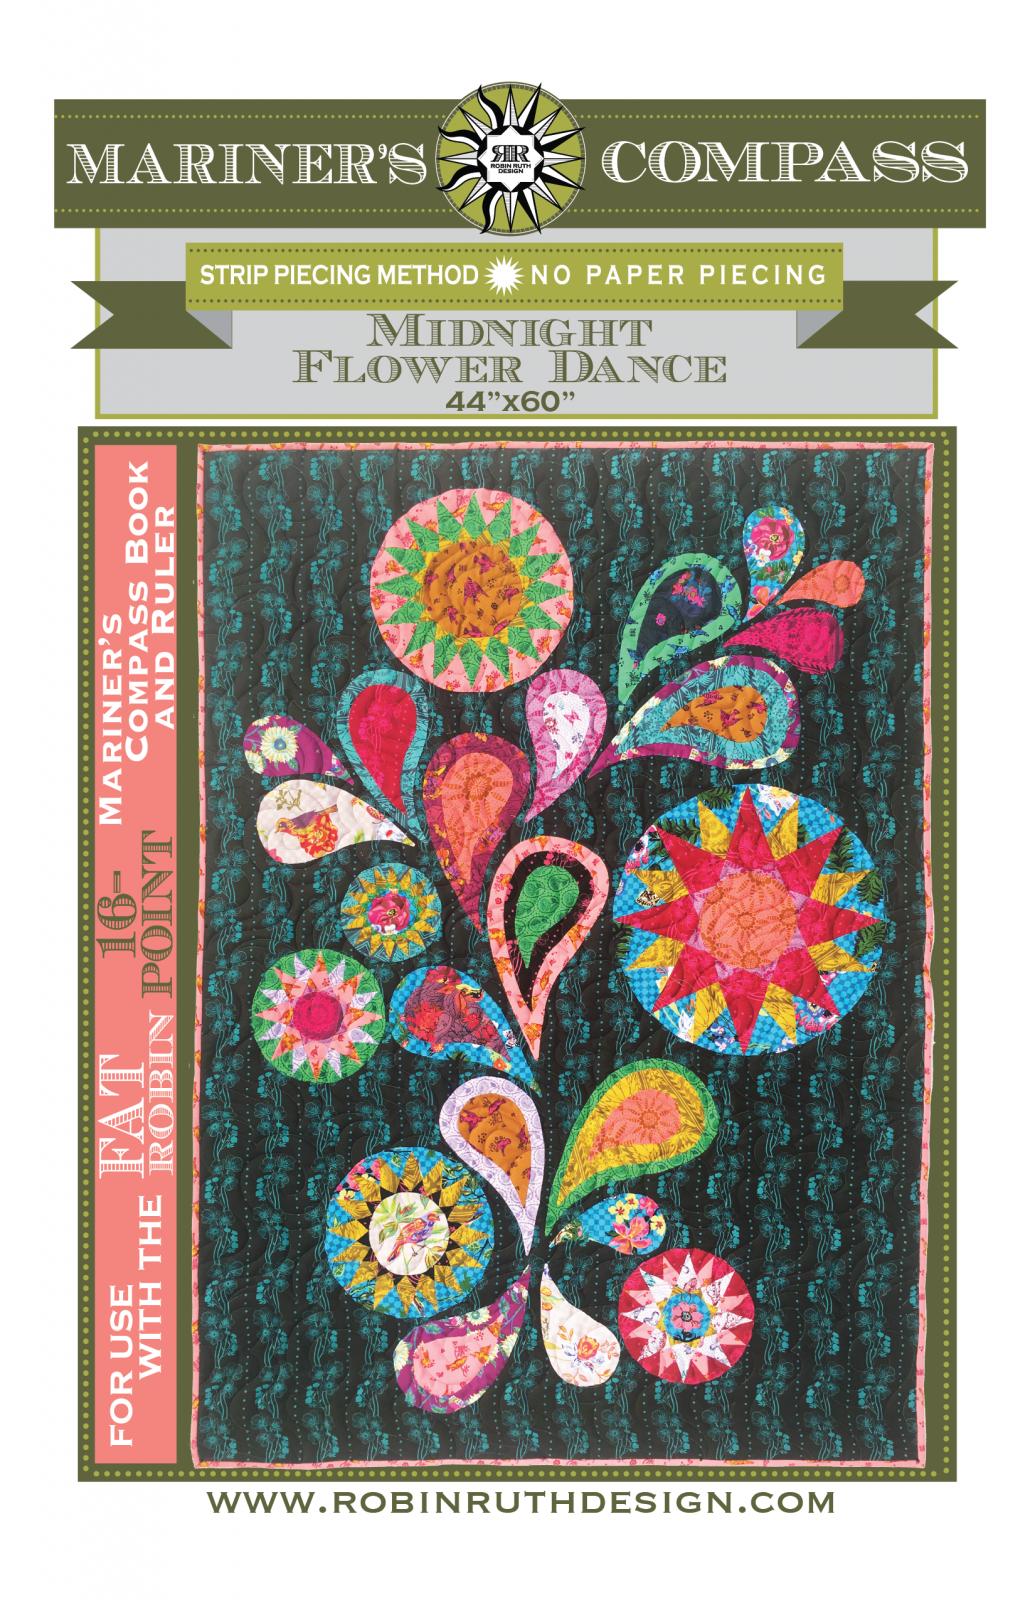 Midnight Flower Dance Pattern by Robin Ruth Design